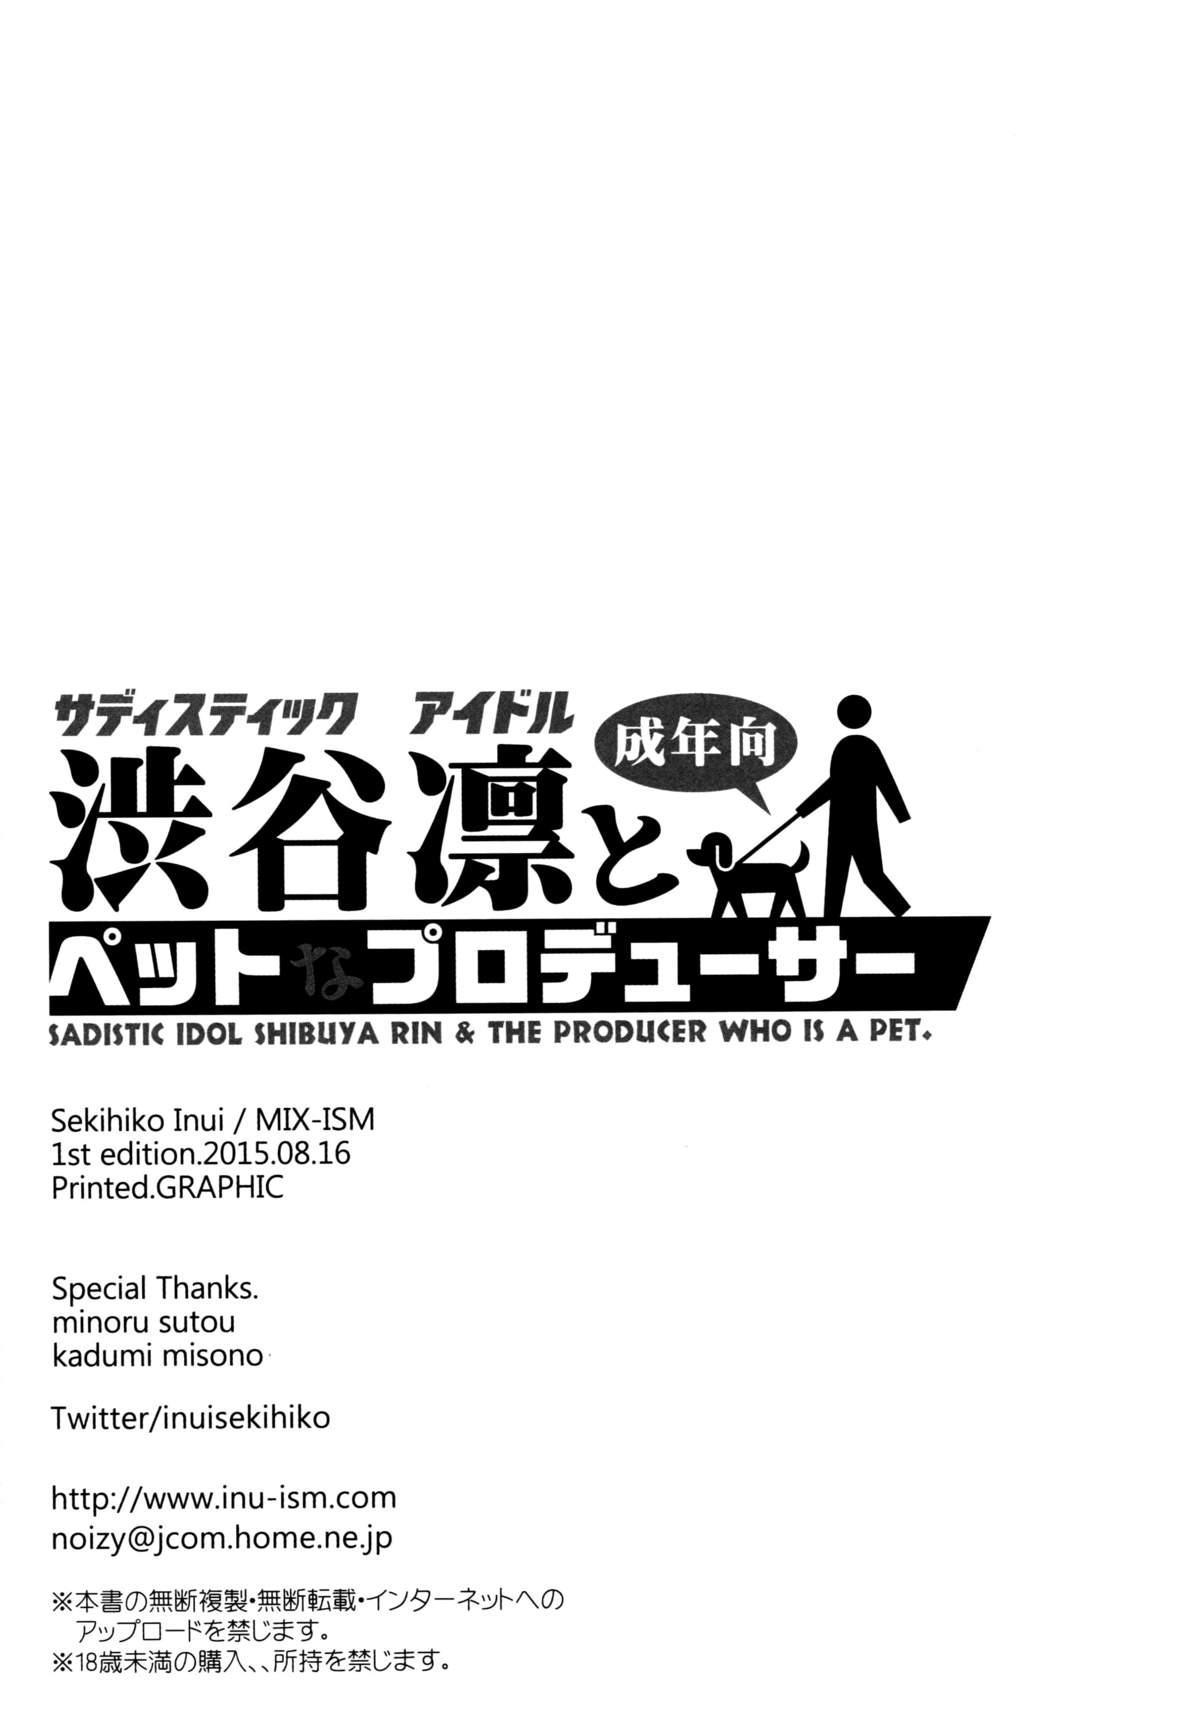 Sadistic Idol Shibuya Rin to Pet na Producer 25